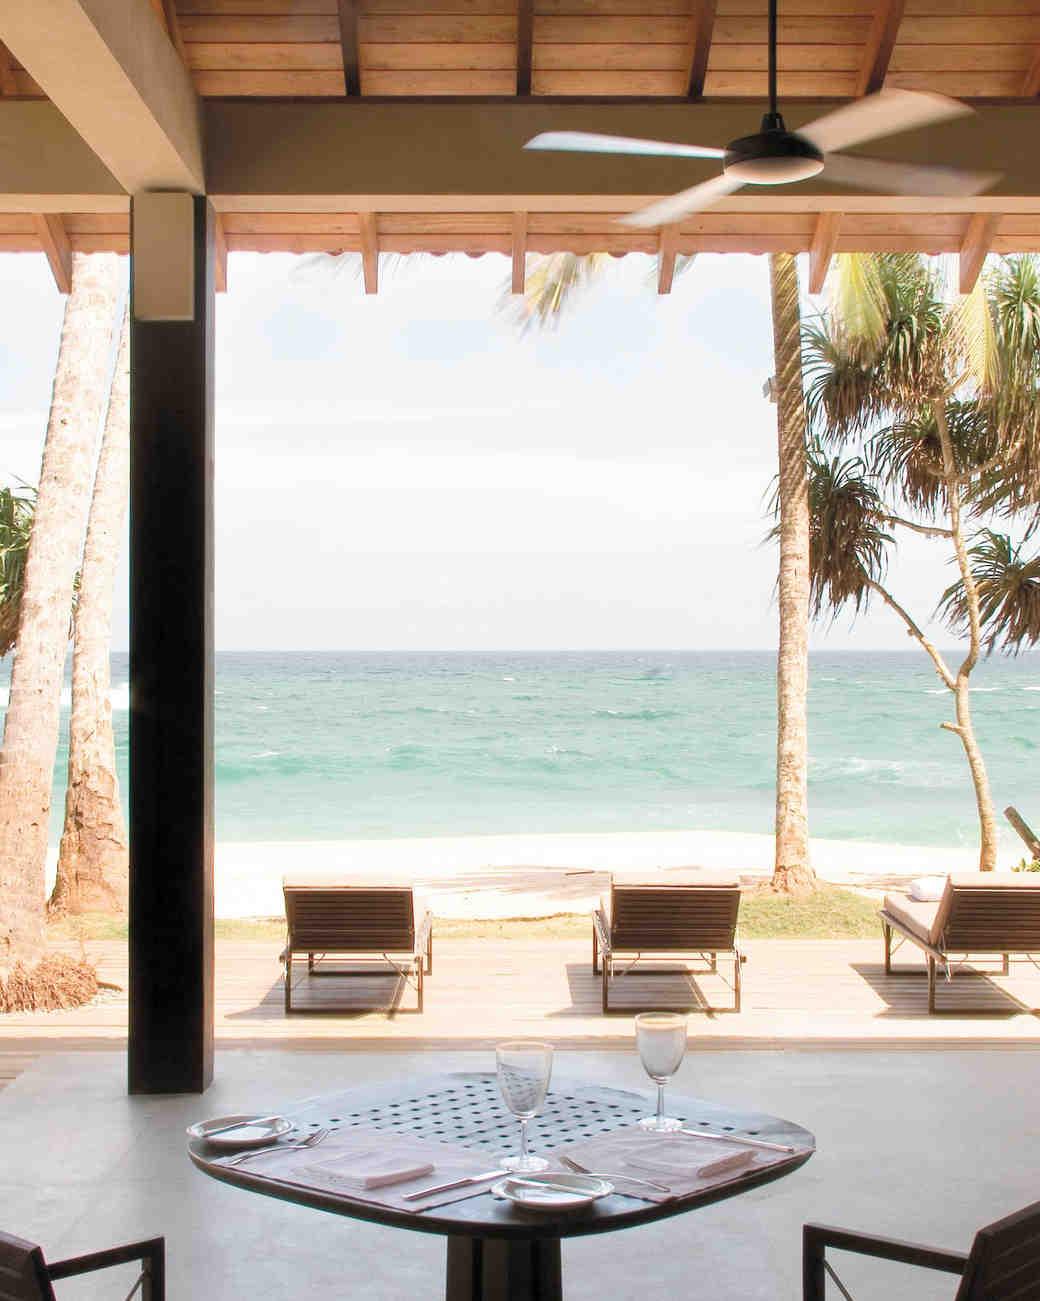 honeymoon-destinations-2015-sri-lanka-amanwella-beach-0115.jpg